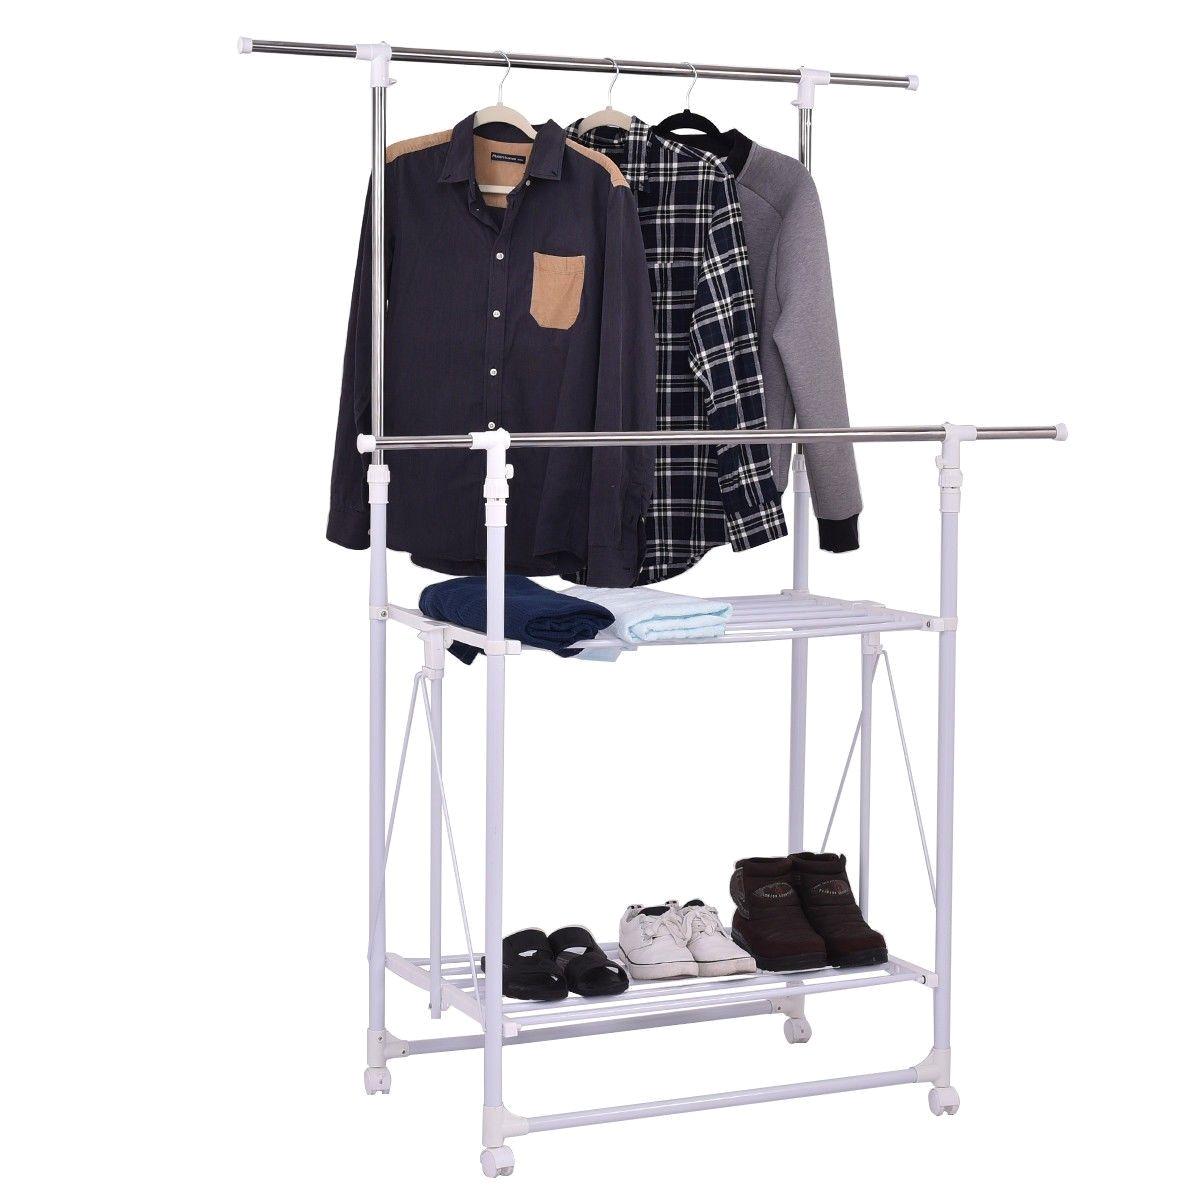 double rail folding adjustable rolling clothes rack hanger w 2 shelves